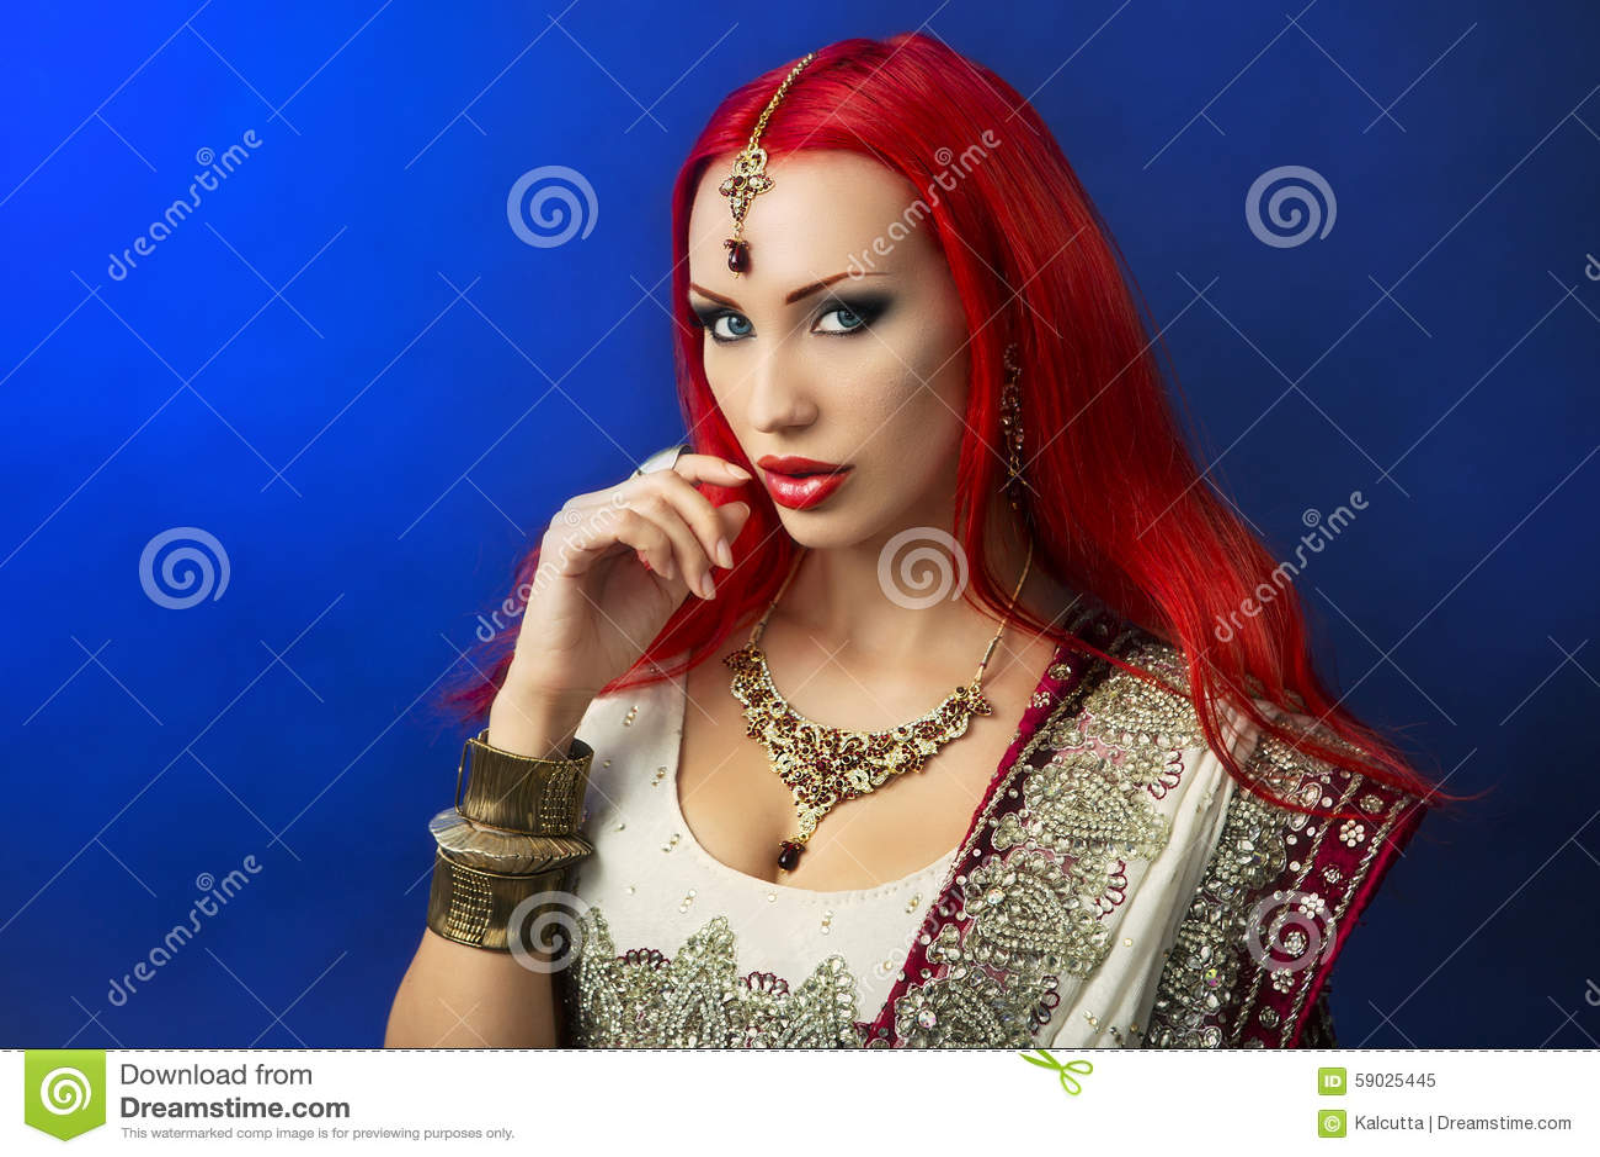 Beautiful Redhead Woman in Traditional Indian Sari Clothing